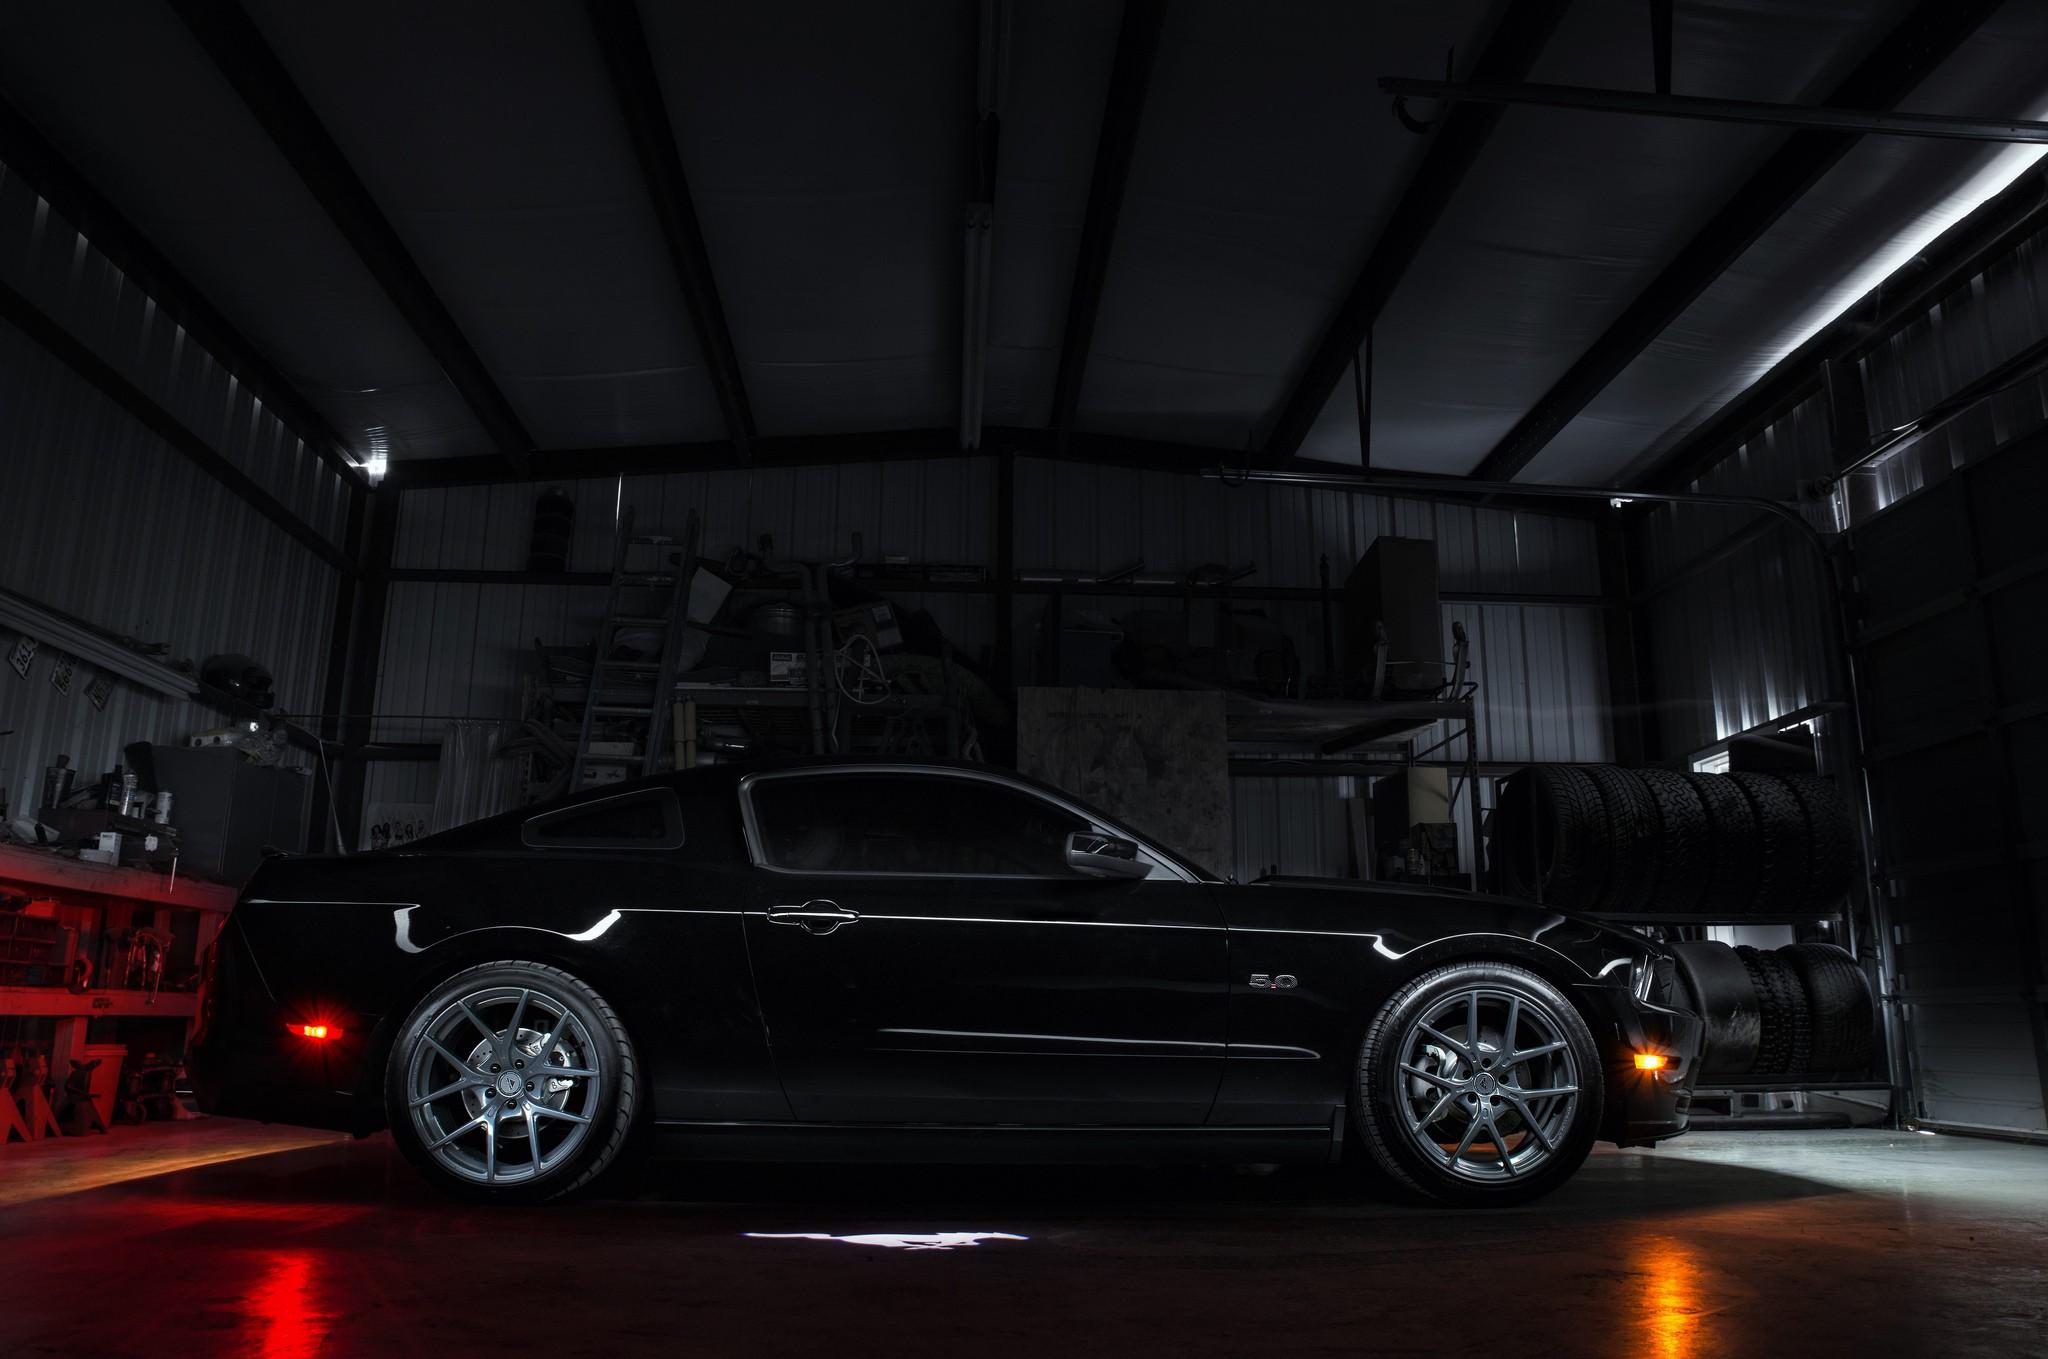 Masaustu Araba Arac Ford Mustang Kas Arabalari Ford Mustangi